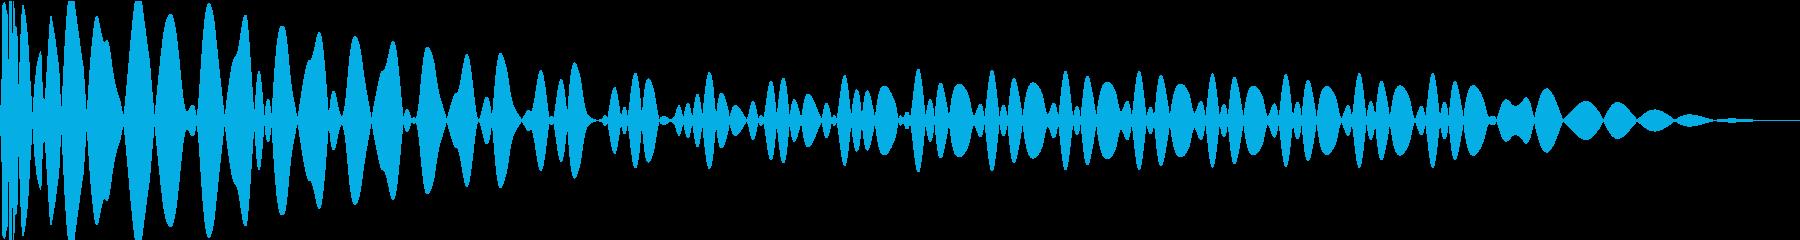 EDMキック キーF#の再生済みの波形